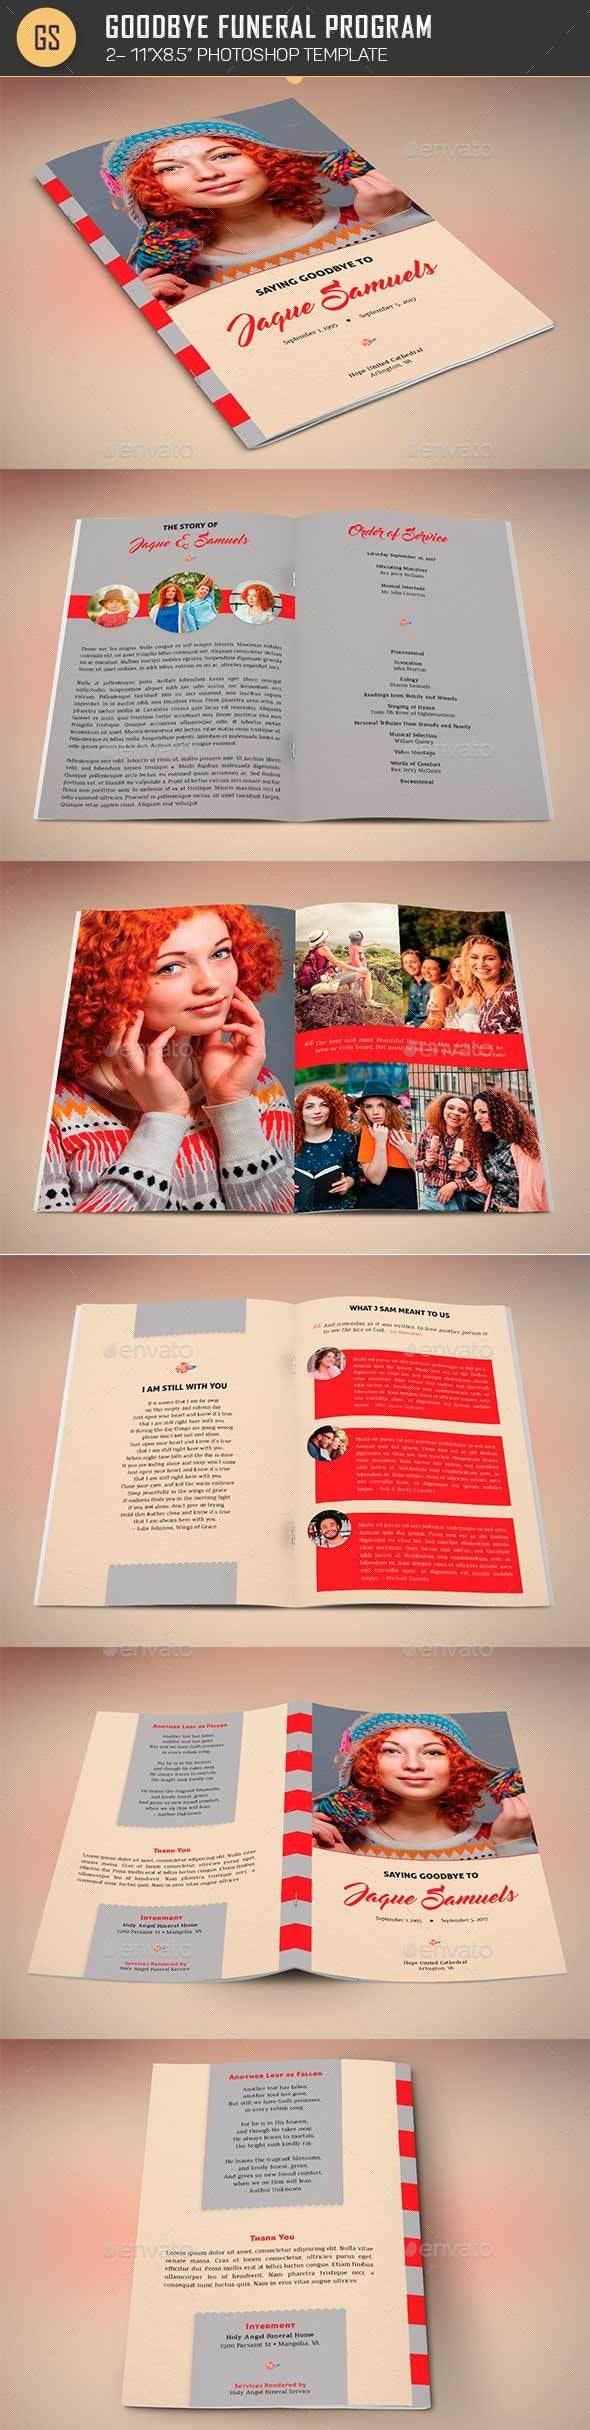 Goodbye Funeral Program Template - Informational Brochures